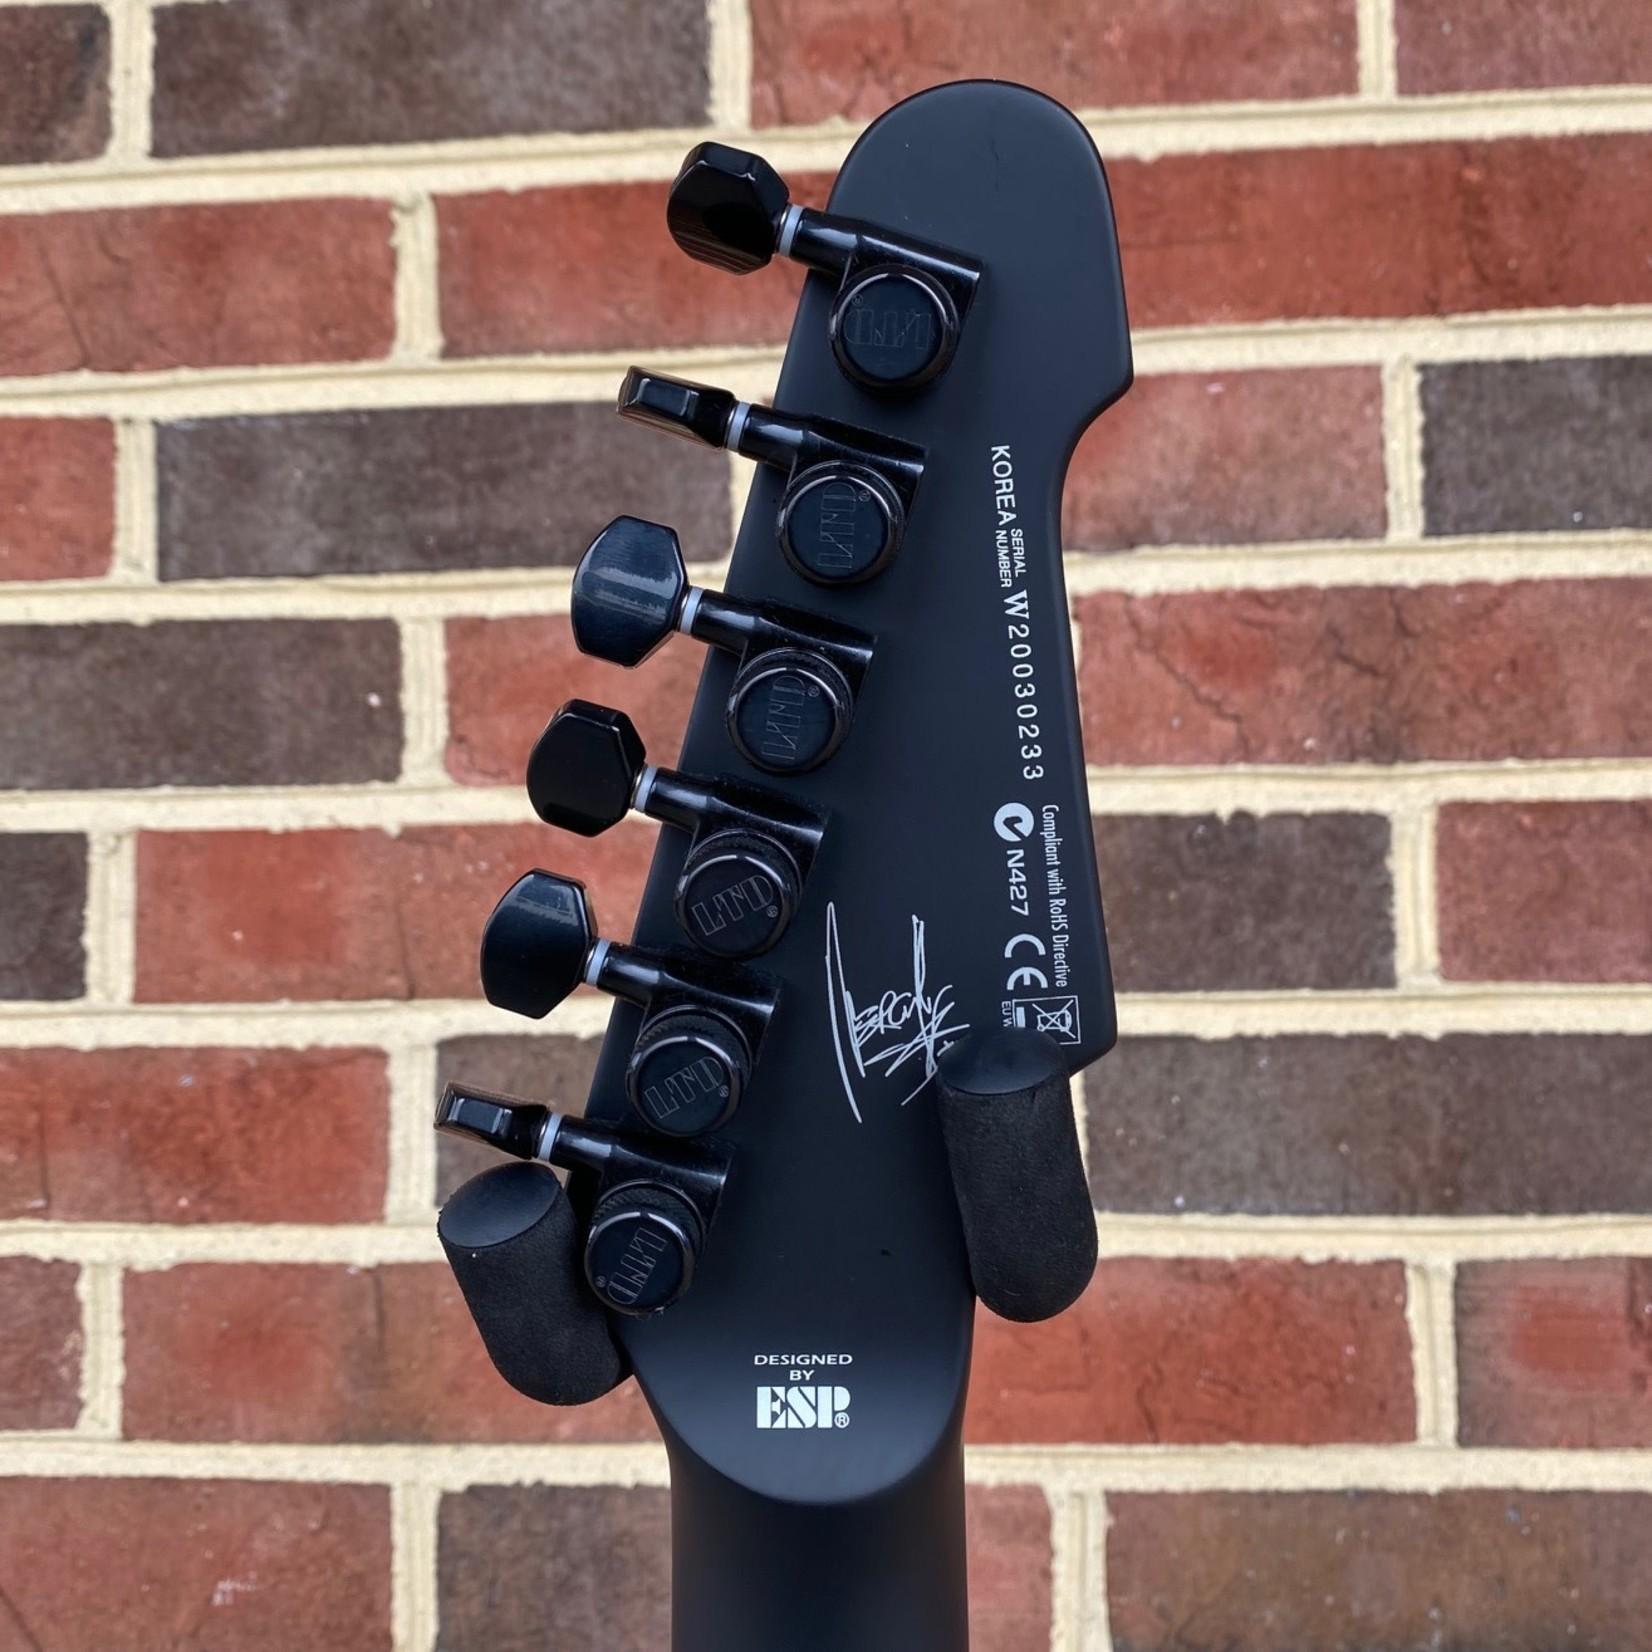 ESP ESP LTD NS-6BLKS, Nergal Signature, Black Satin, Stream body, Macassar Ebony Fretboard, Fishman Fluence Modern Pickups, Hardshell Case